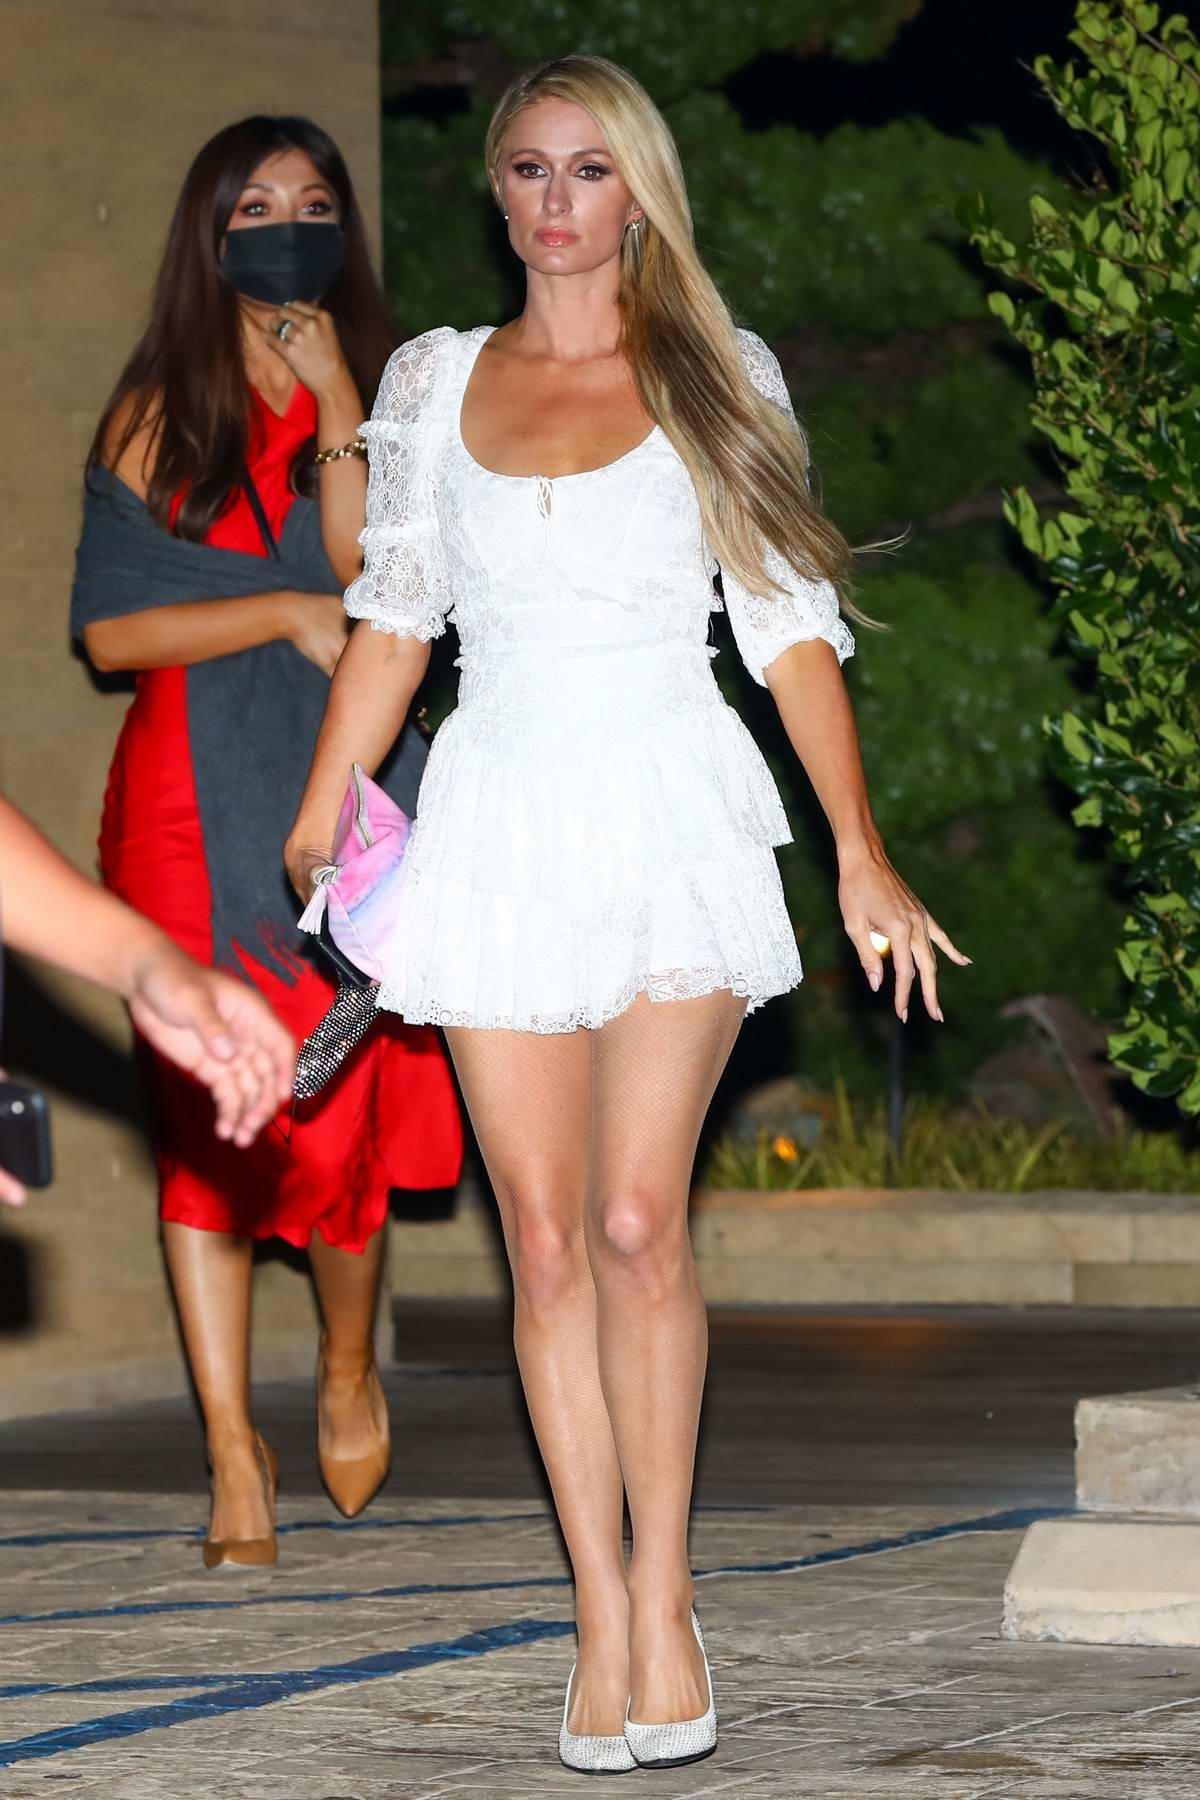 Paris Hilton flaunts her long legs in a white mini dress during a dinner outing at Nobu in Malibu, California